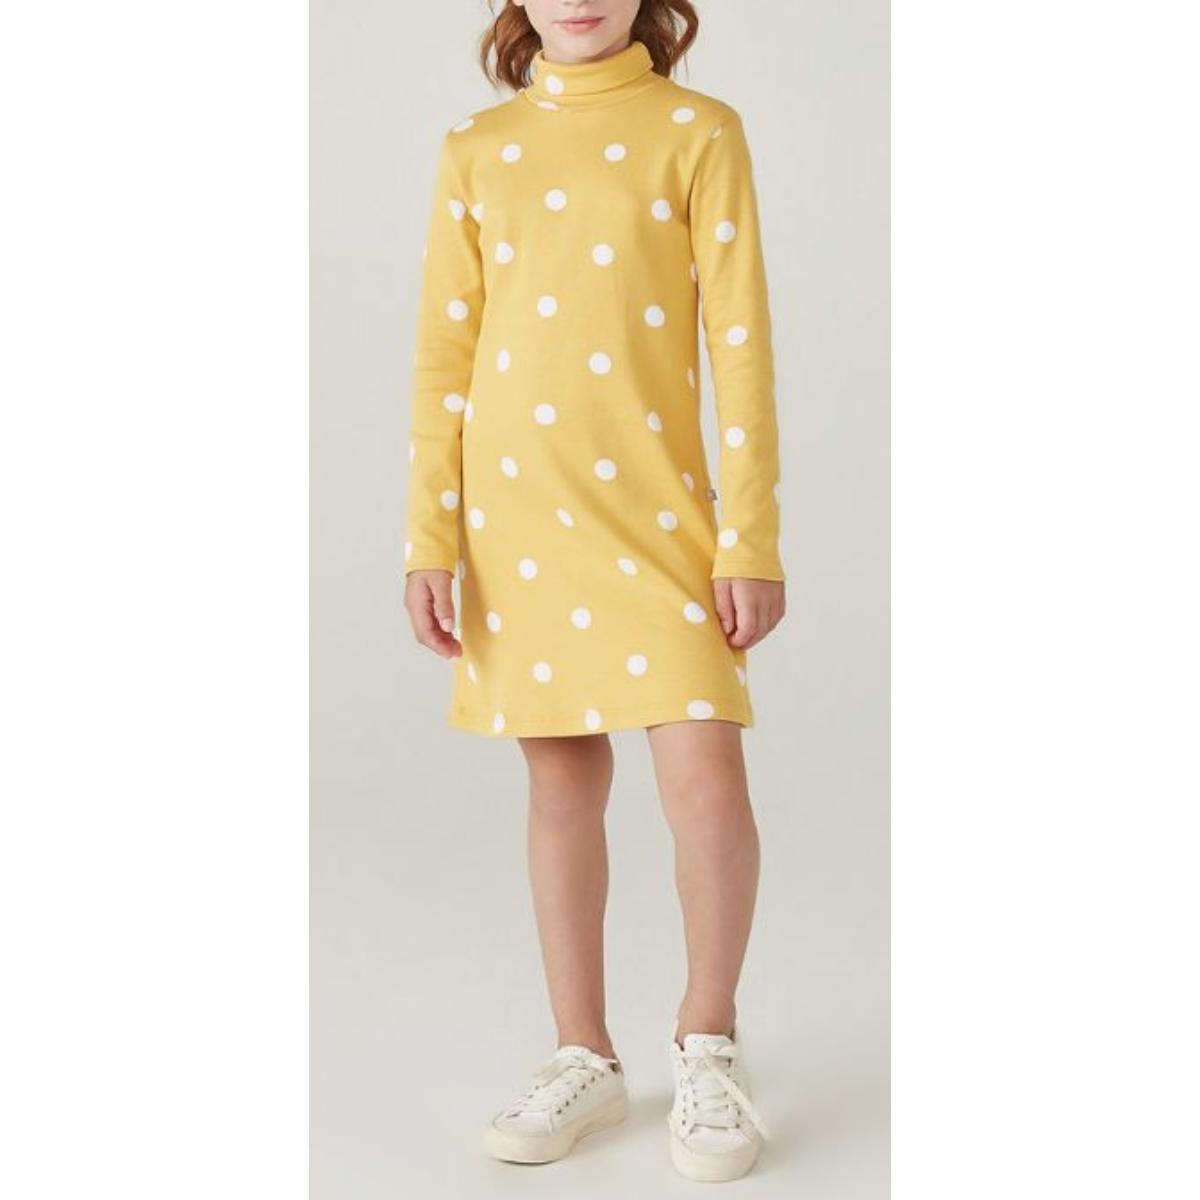 Vestido Feminino Hering Kids 5awt 1ben Amarelo Poa